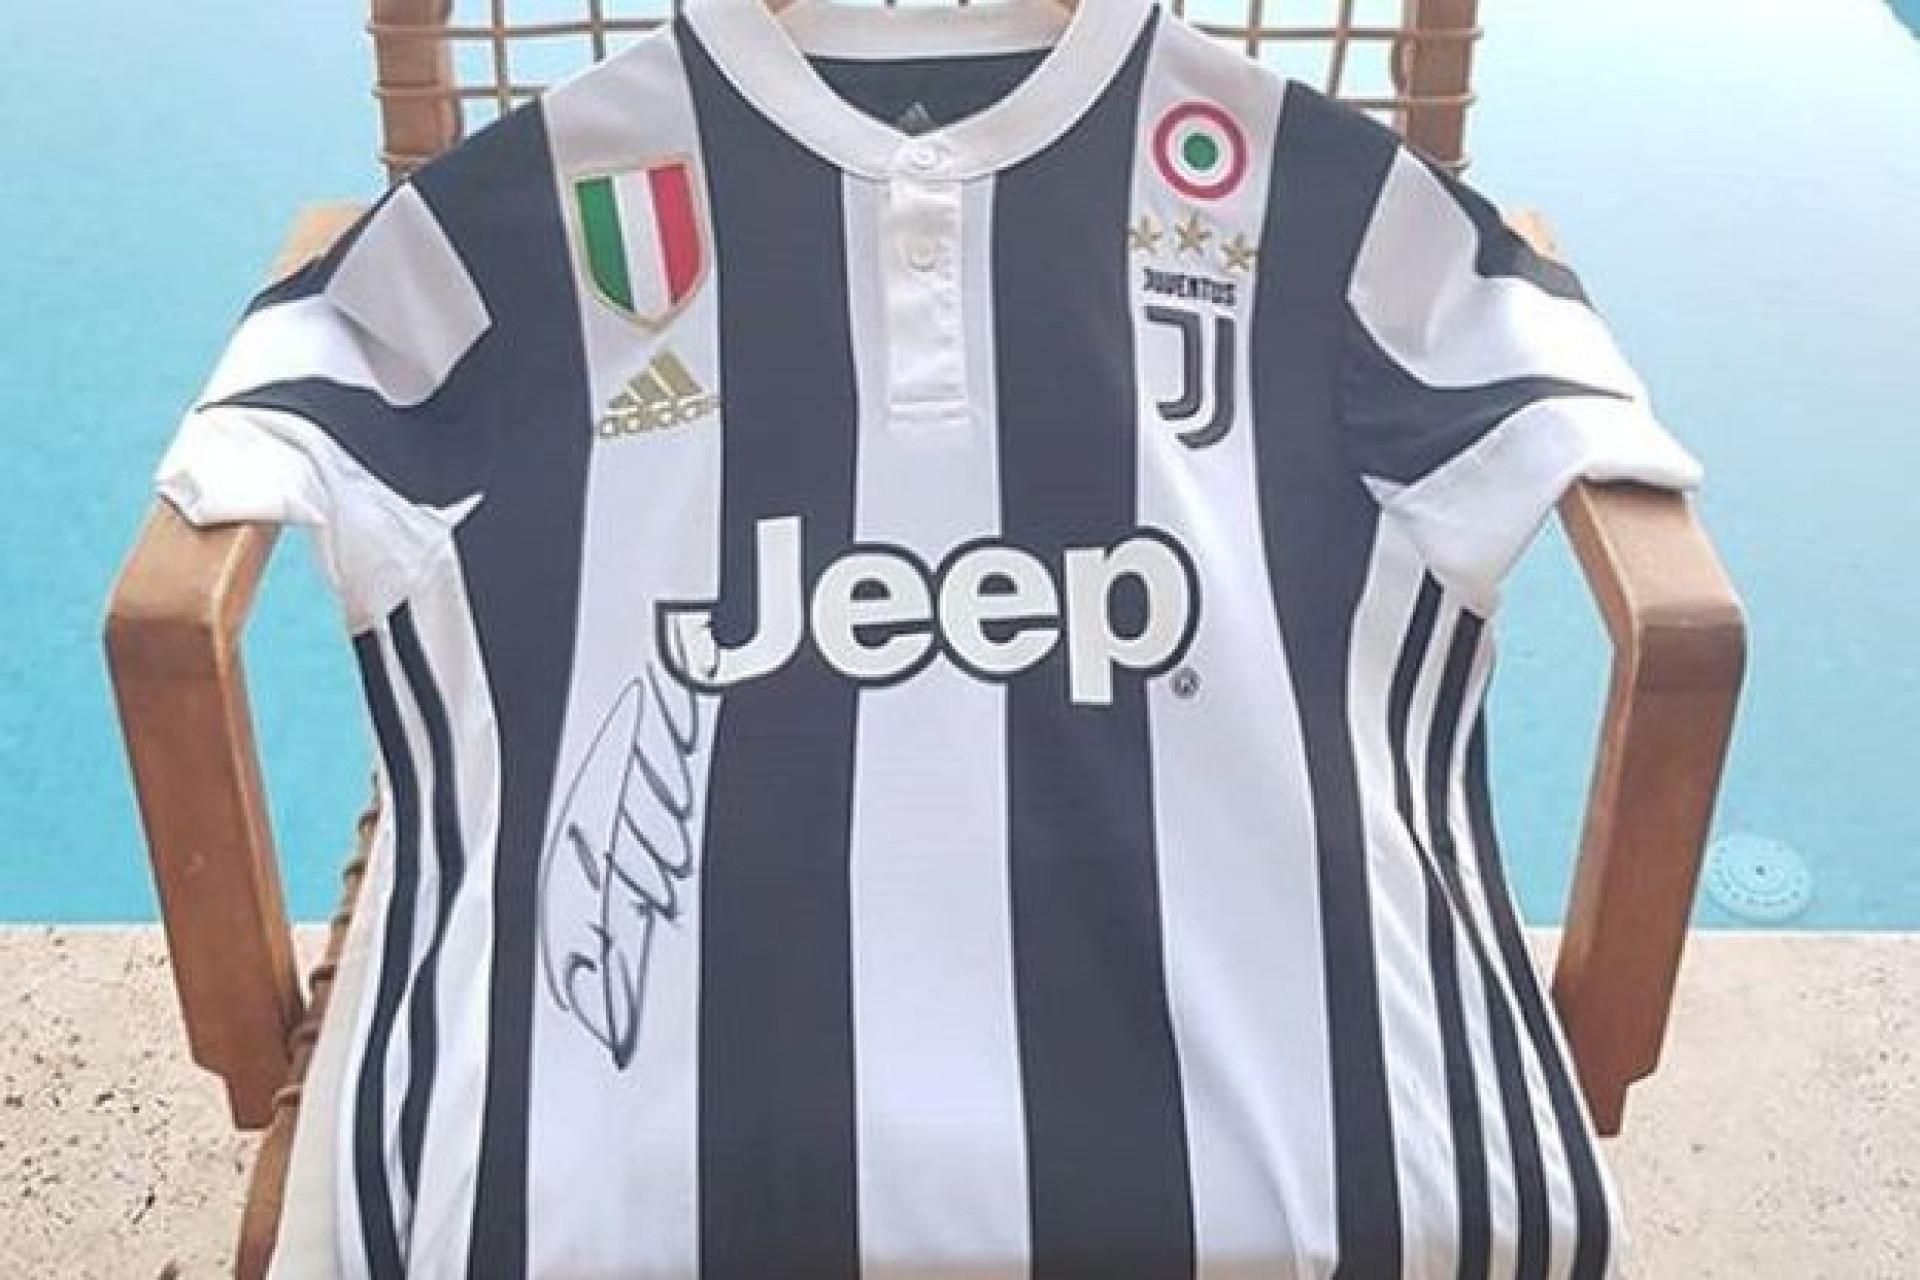 O primeiro autógrafo de Cristiano Ronaldo como jogador da Juventus